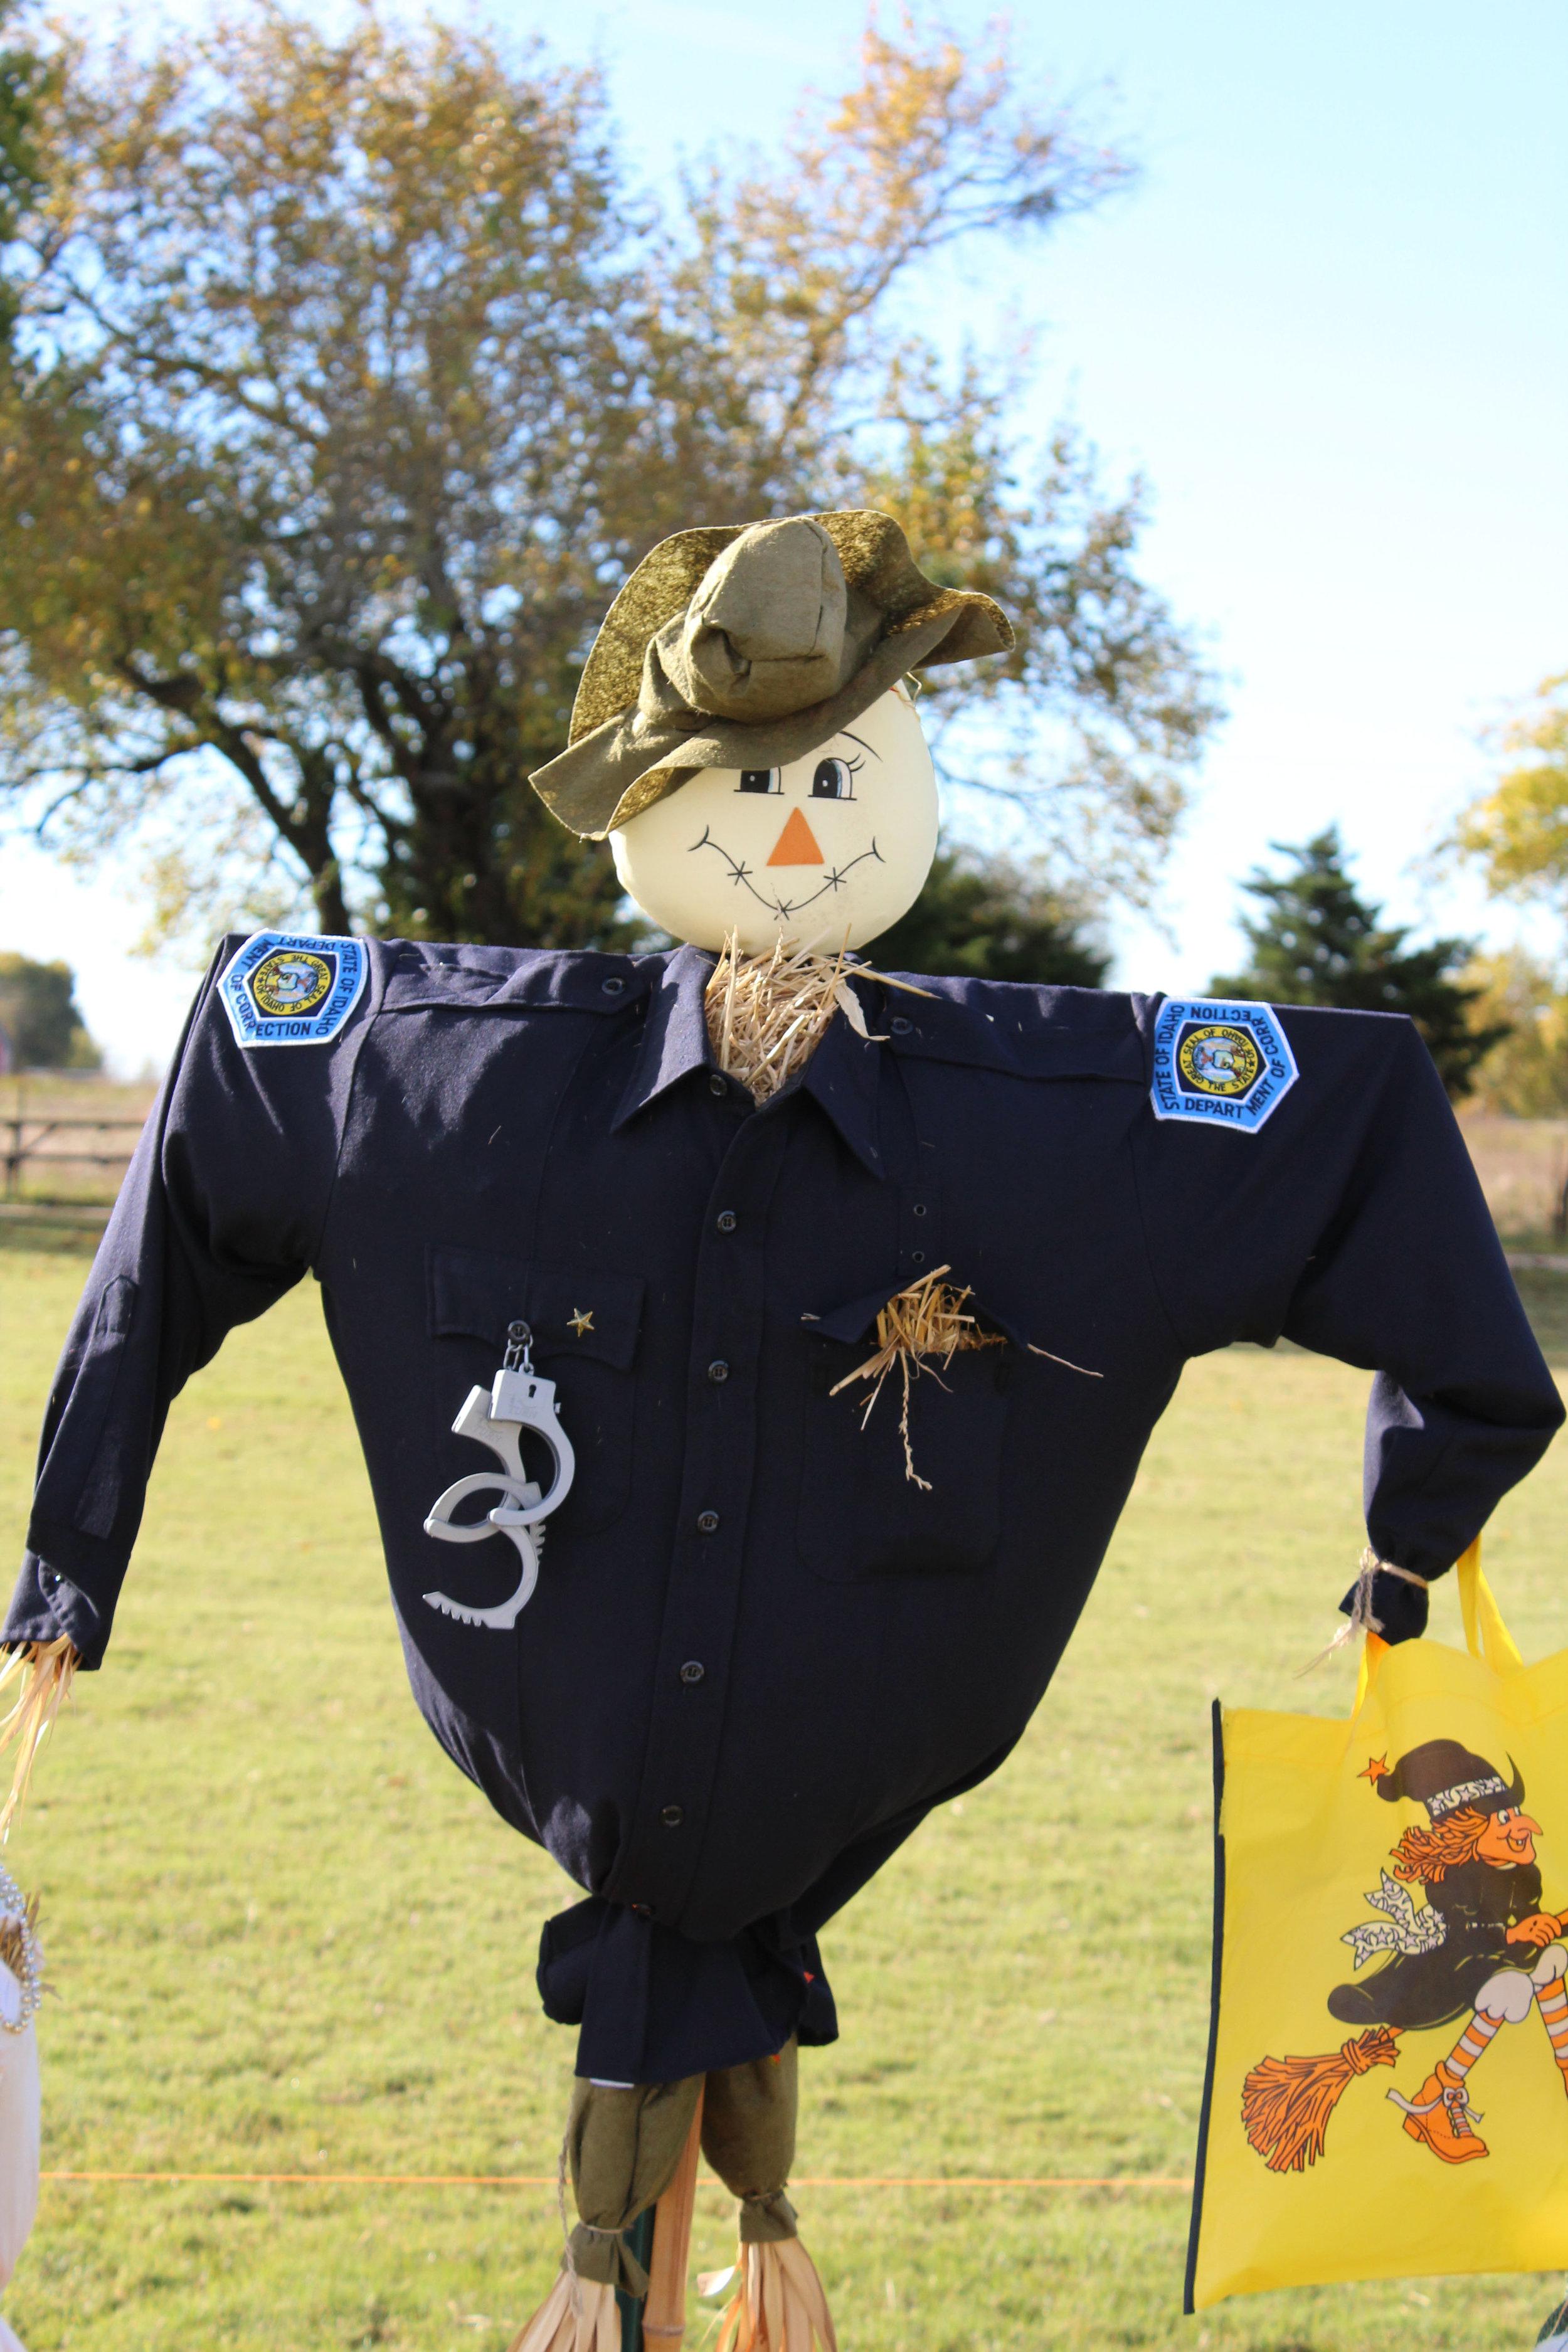 Lucas arbor scarecrow police.jpg